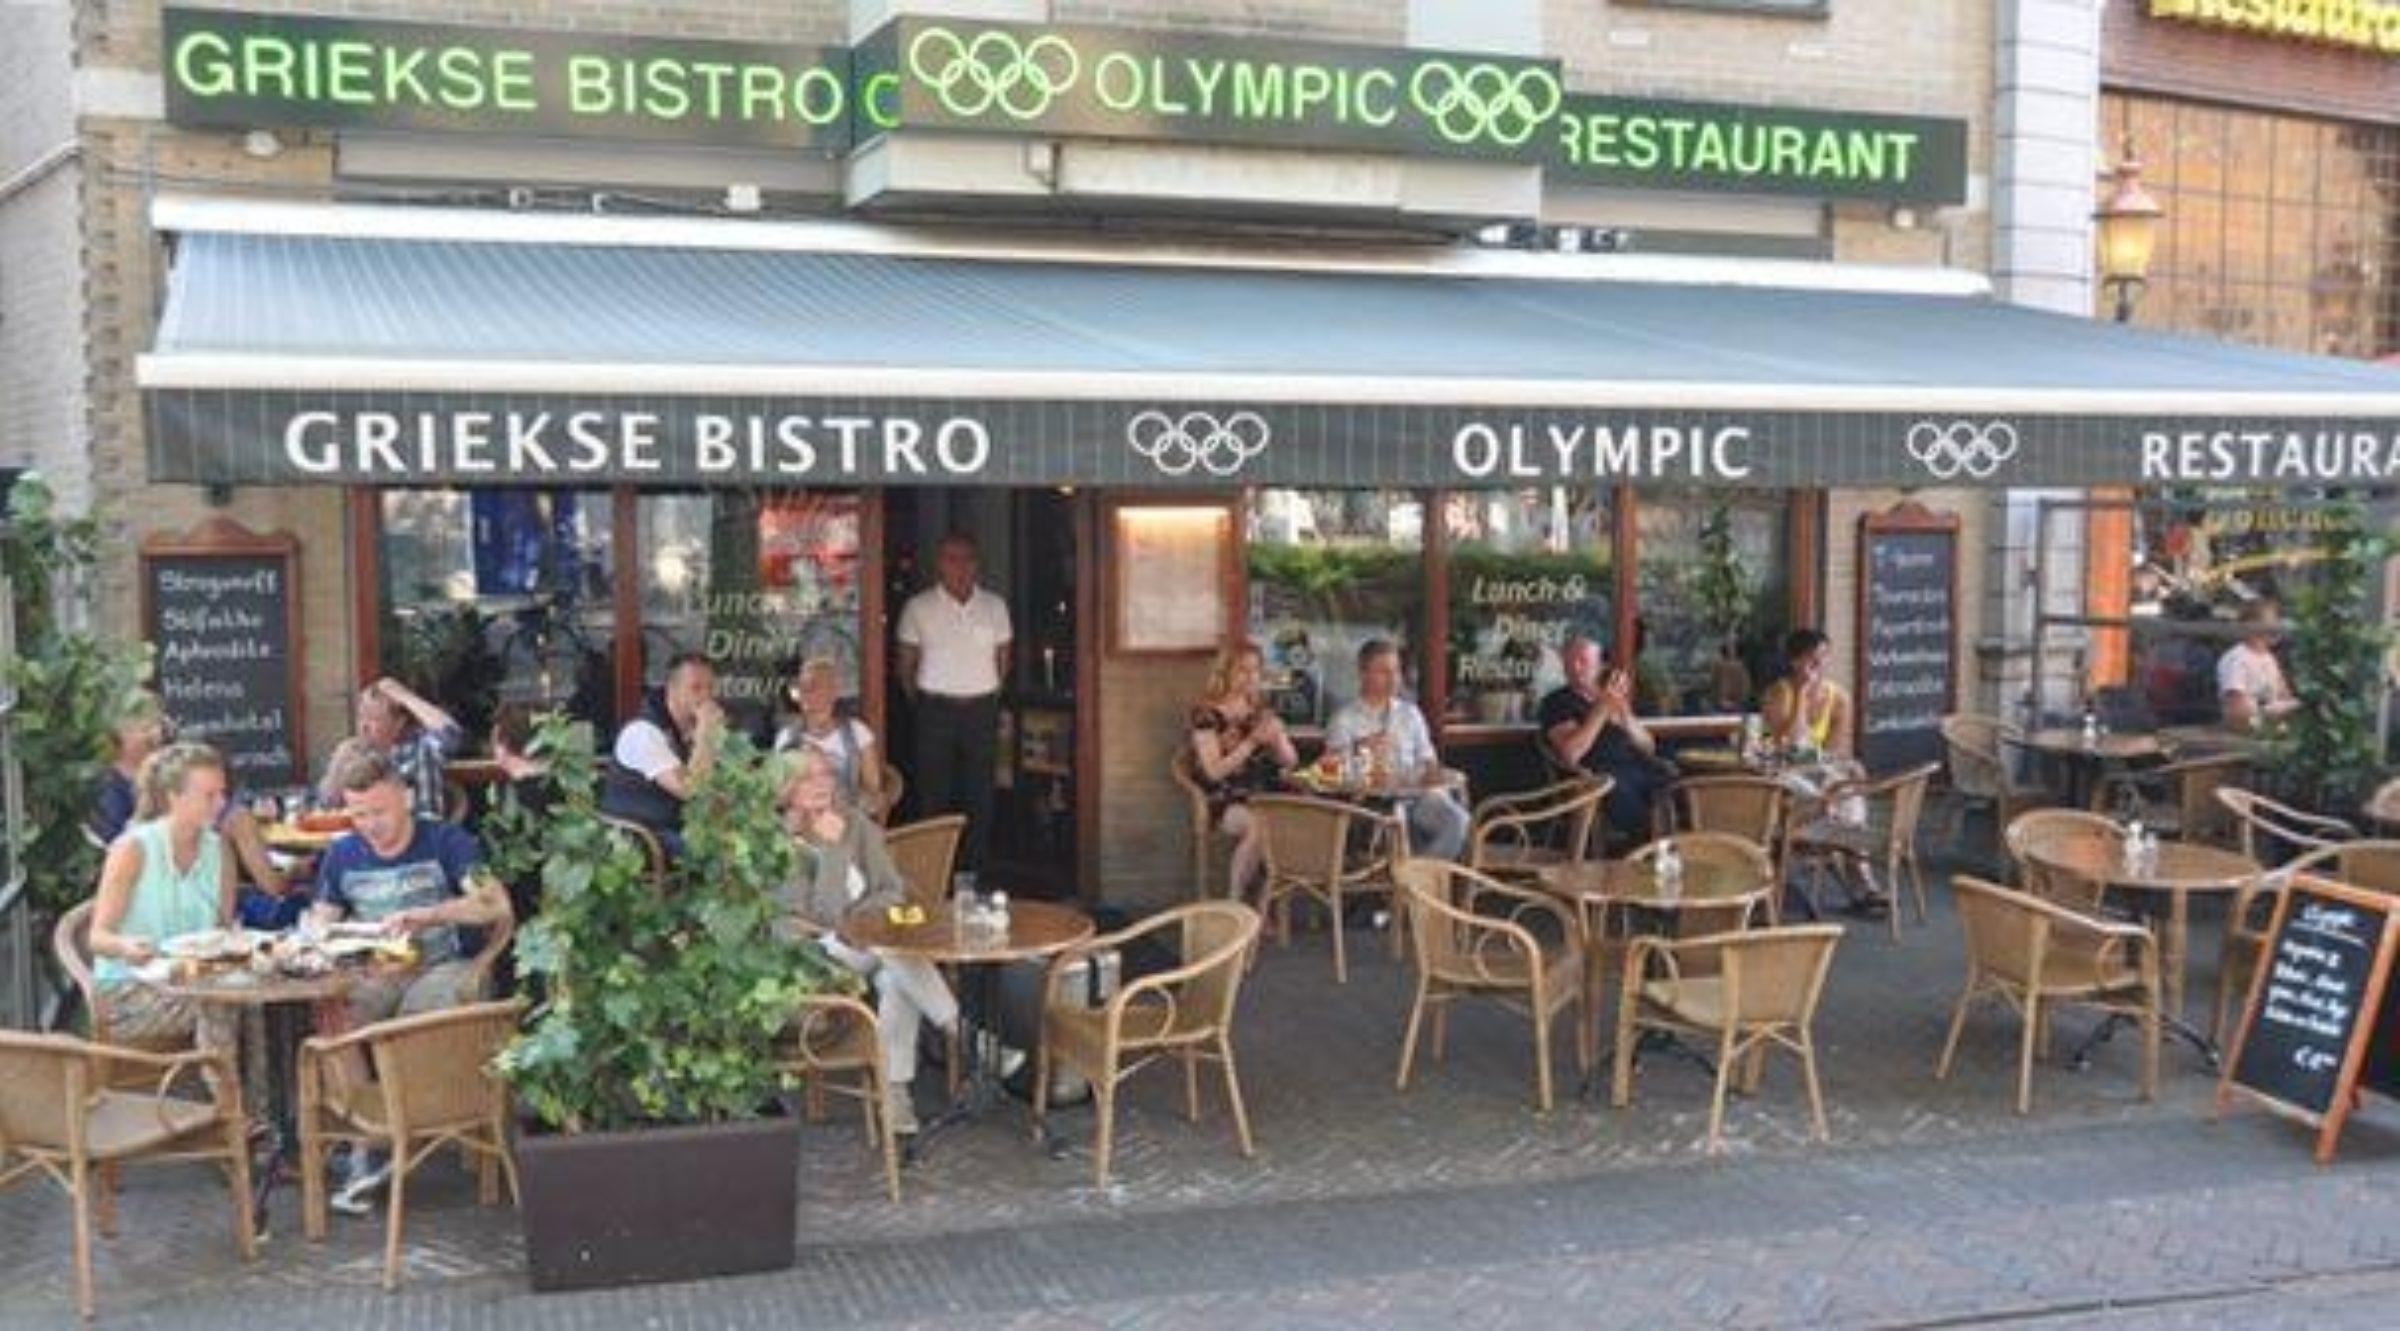 Dinerbon Grieks Bistro Restaurant Olympic Enschede 1